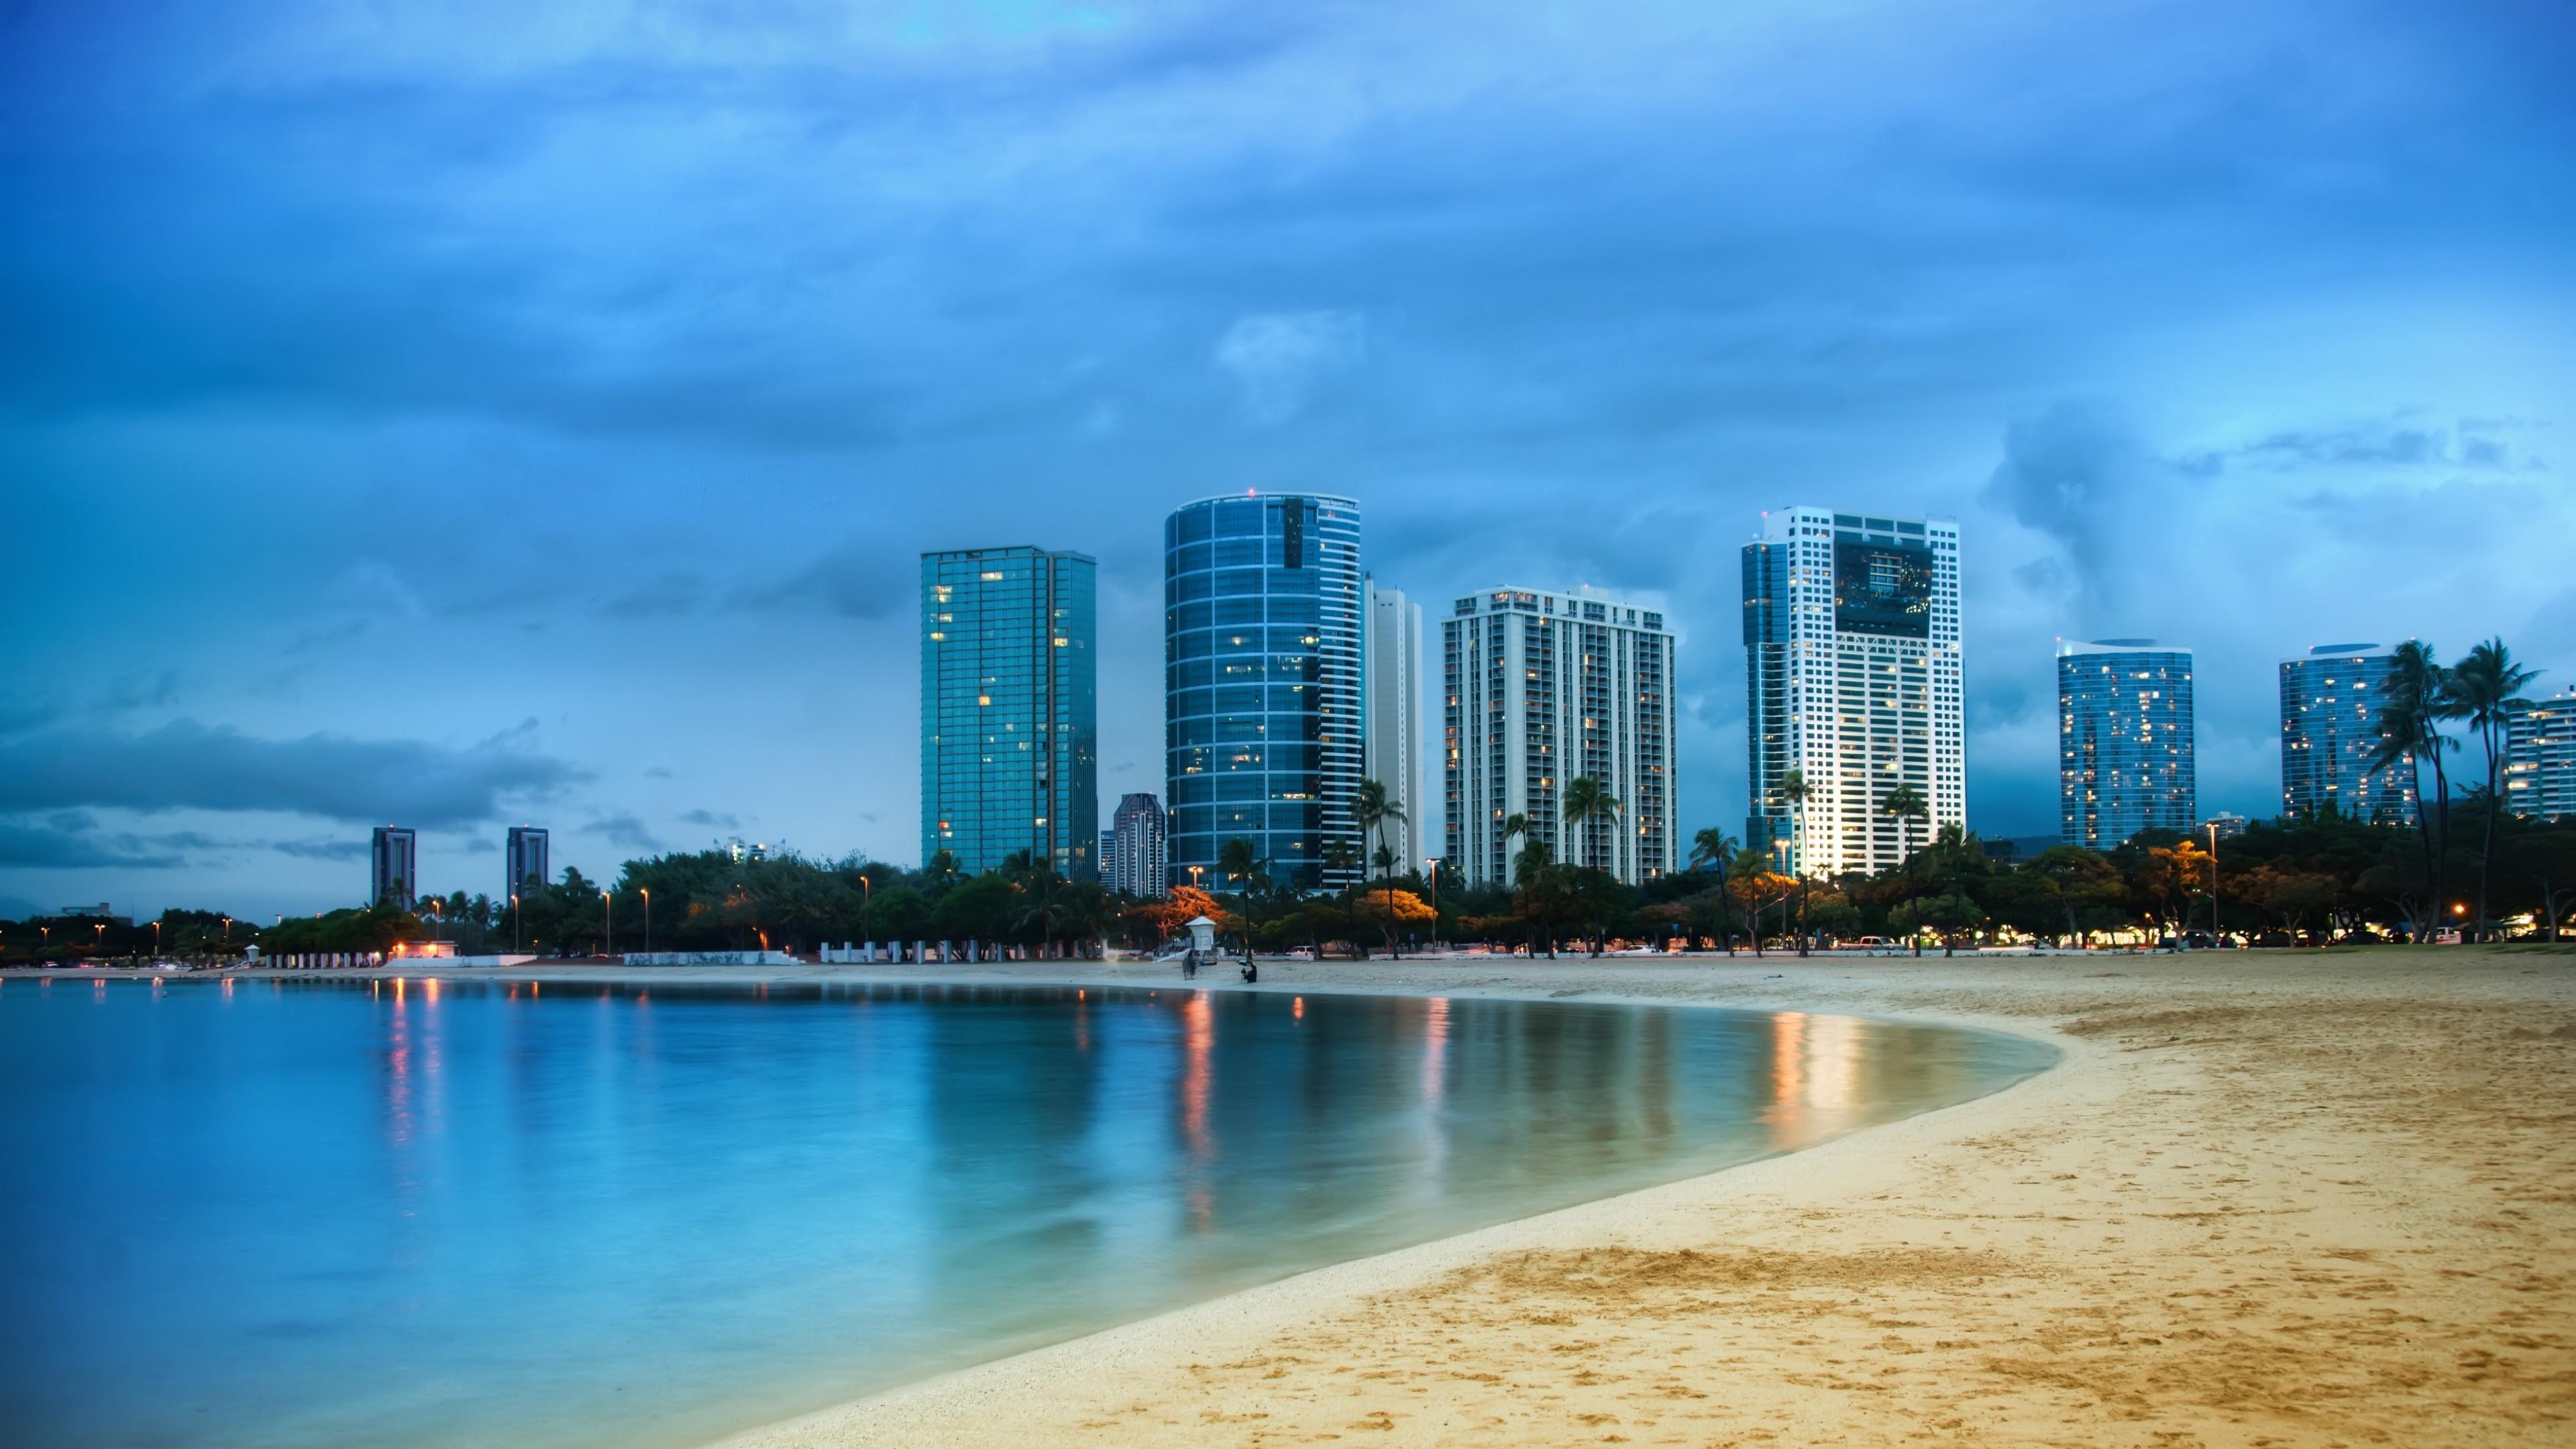 Wallpaper Miami, 5k, 4k wallpaper, ocean, shore, beach ...